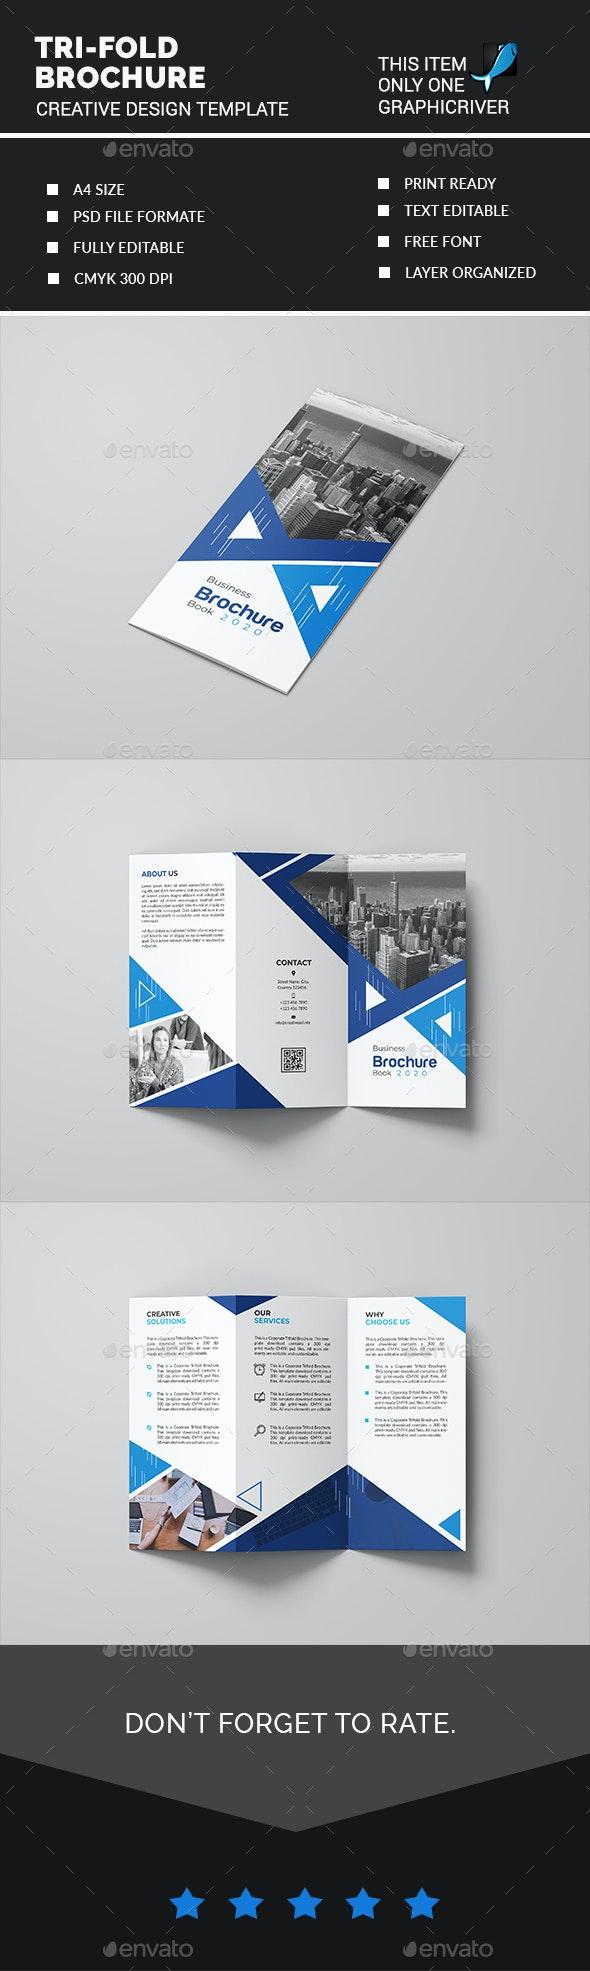 Tri-fold Brochure - Creative Business Cards